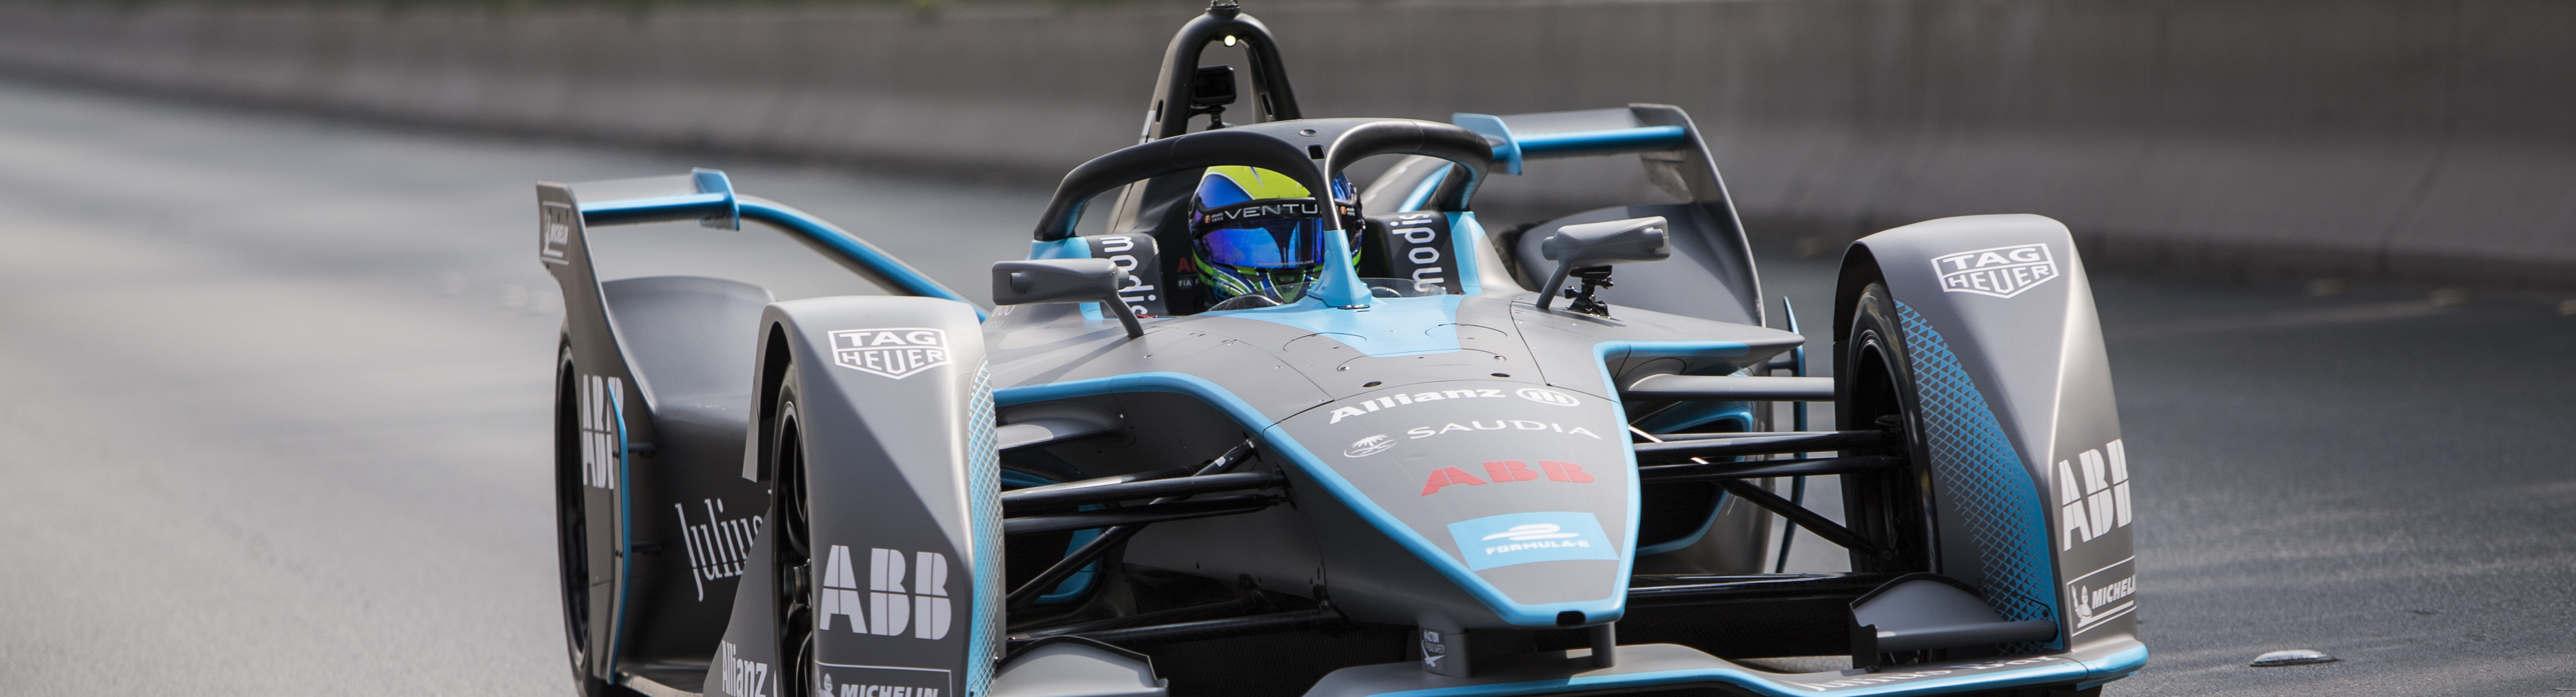 Arthur Leclerc se une al equipo Venturi Formula E para la segunda prueba de novatos en Marrakesh